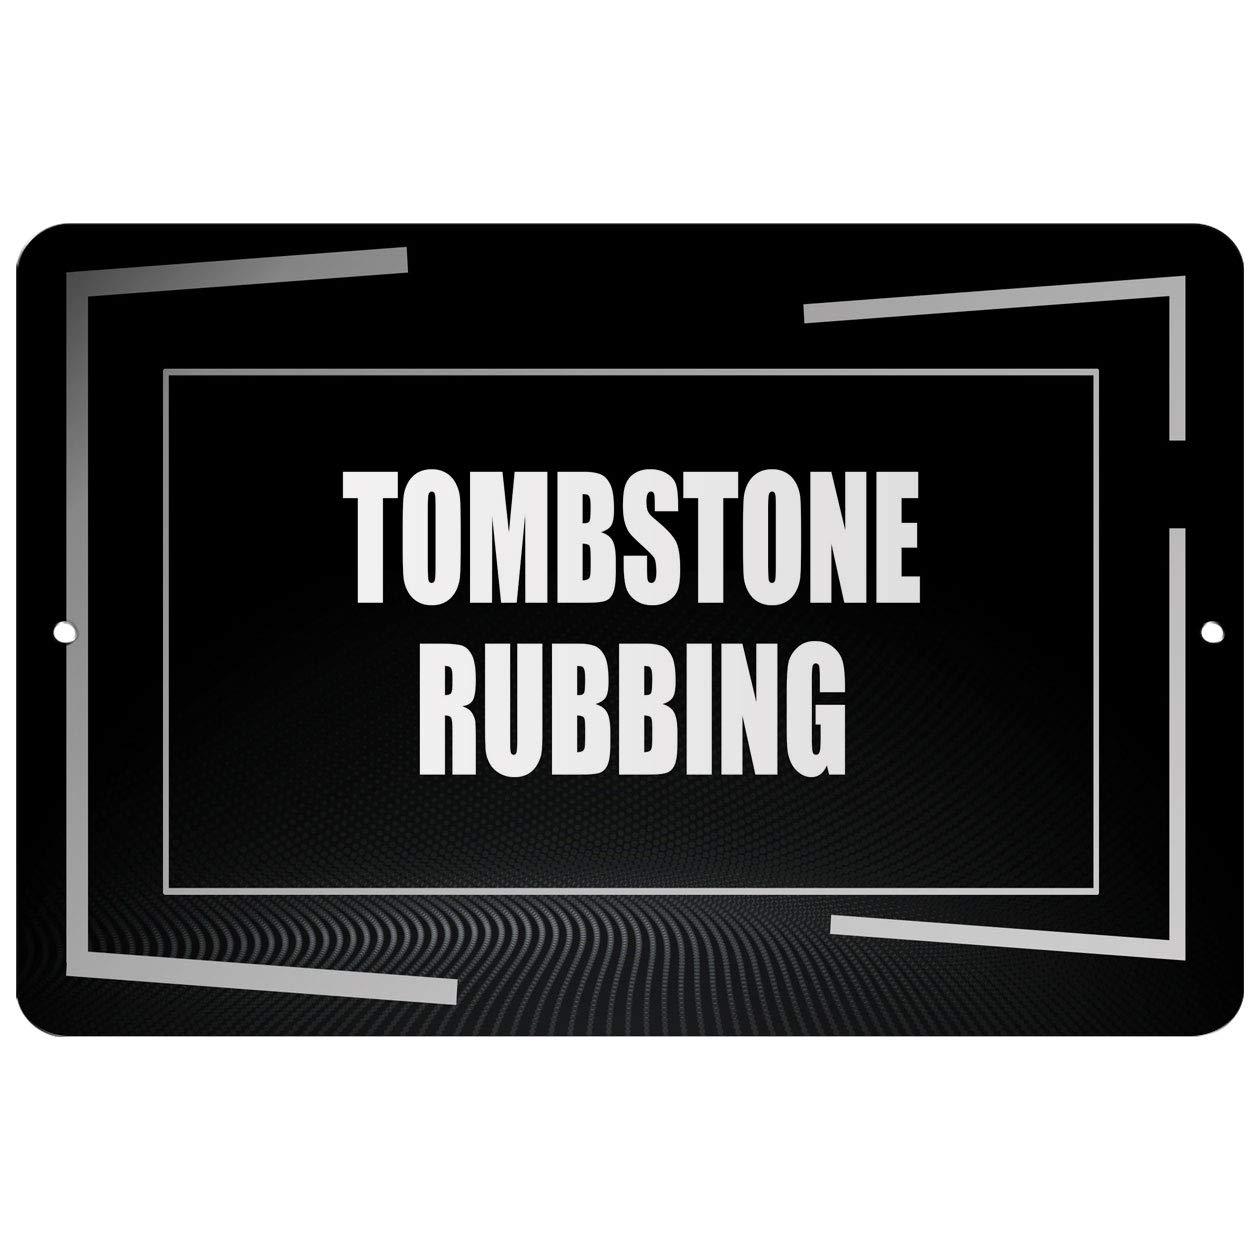 Makoroni - Tombstone RUBBING Hobby - Street Sign 12''x18'' Aluminum by Makoroni